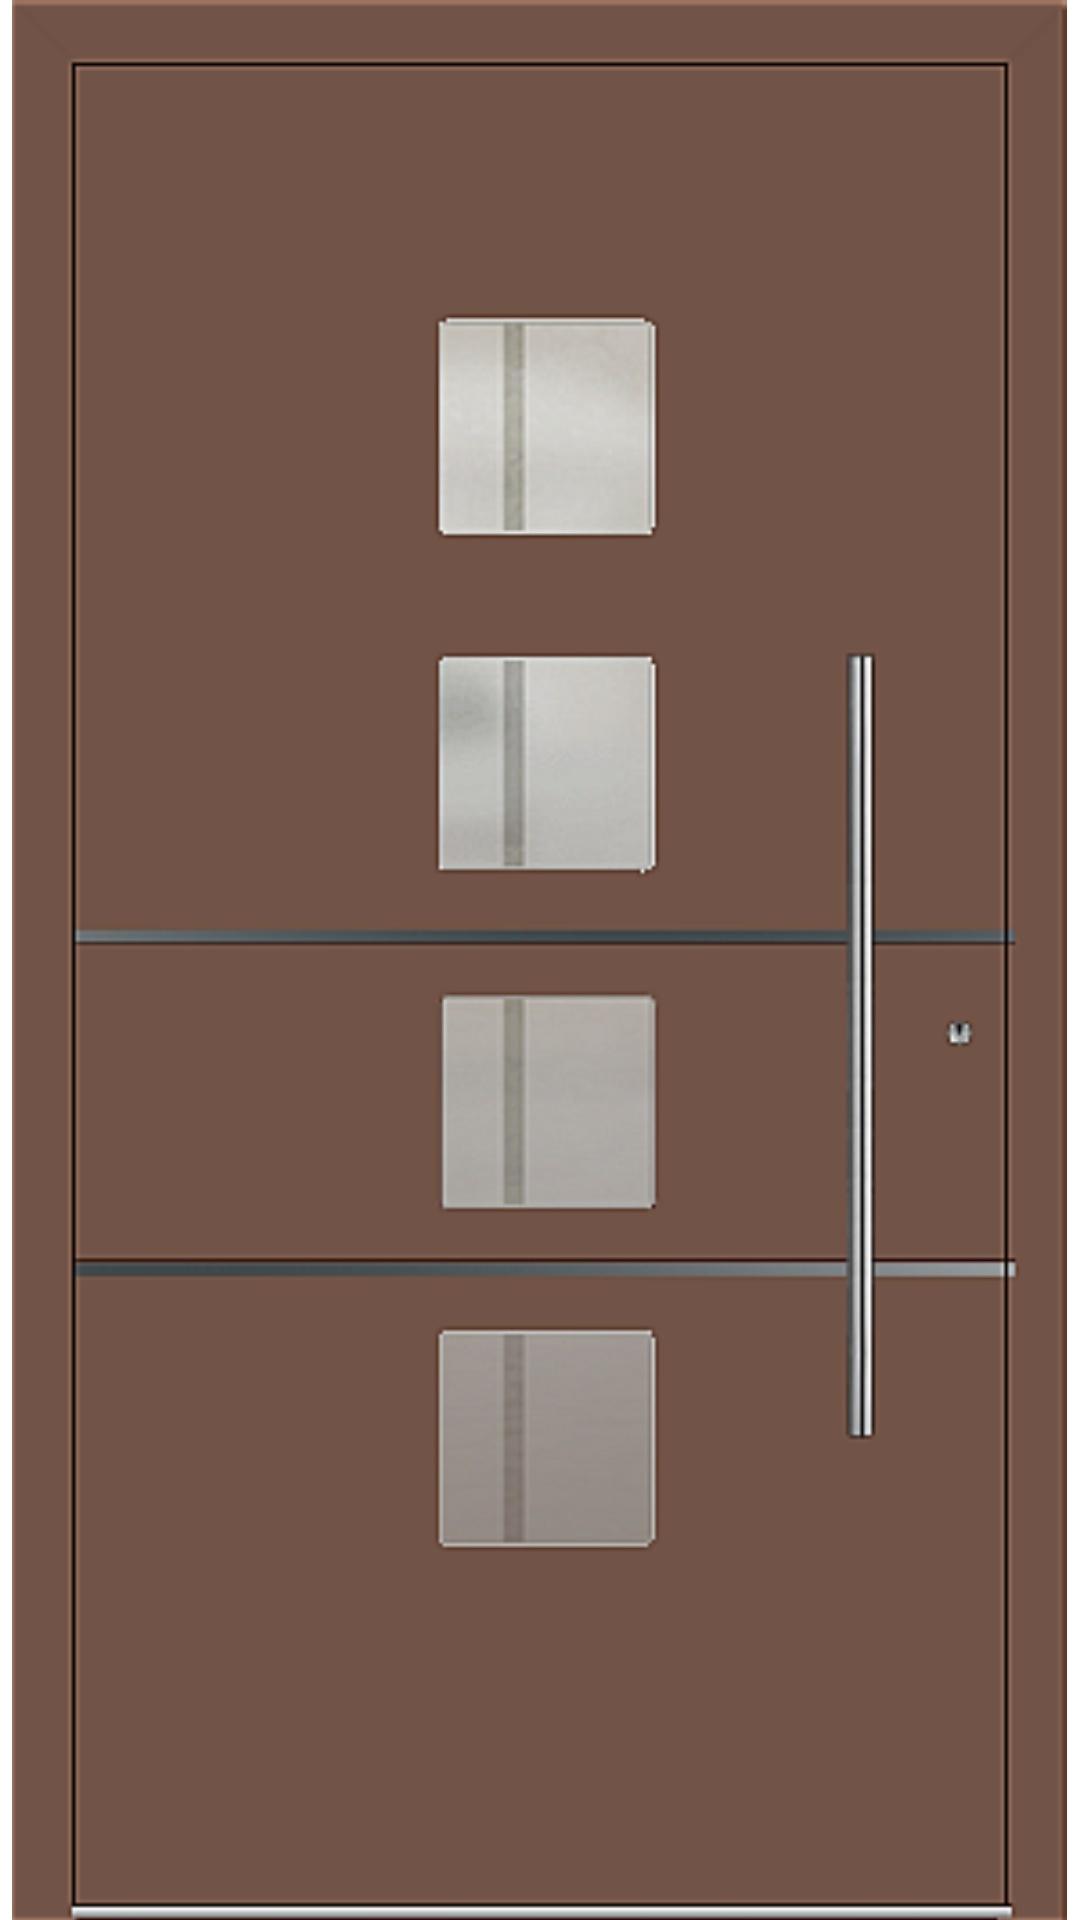 PaXentrée Aluminium Haustür M04450 lehmbraun